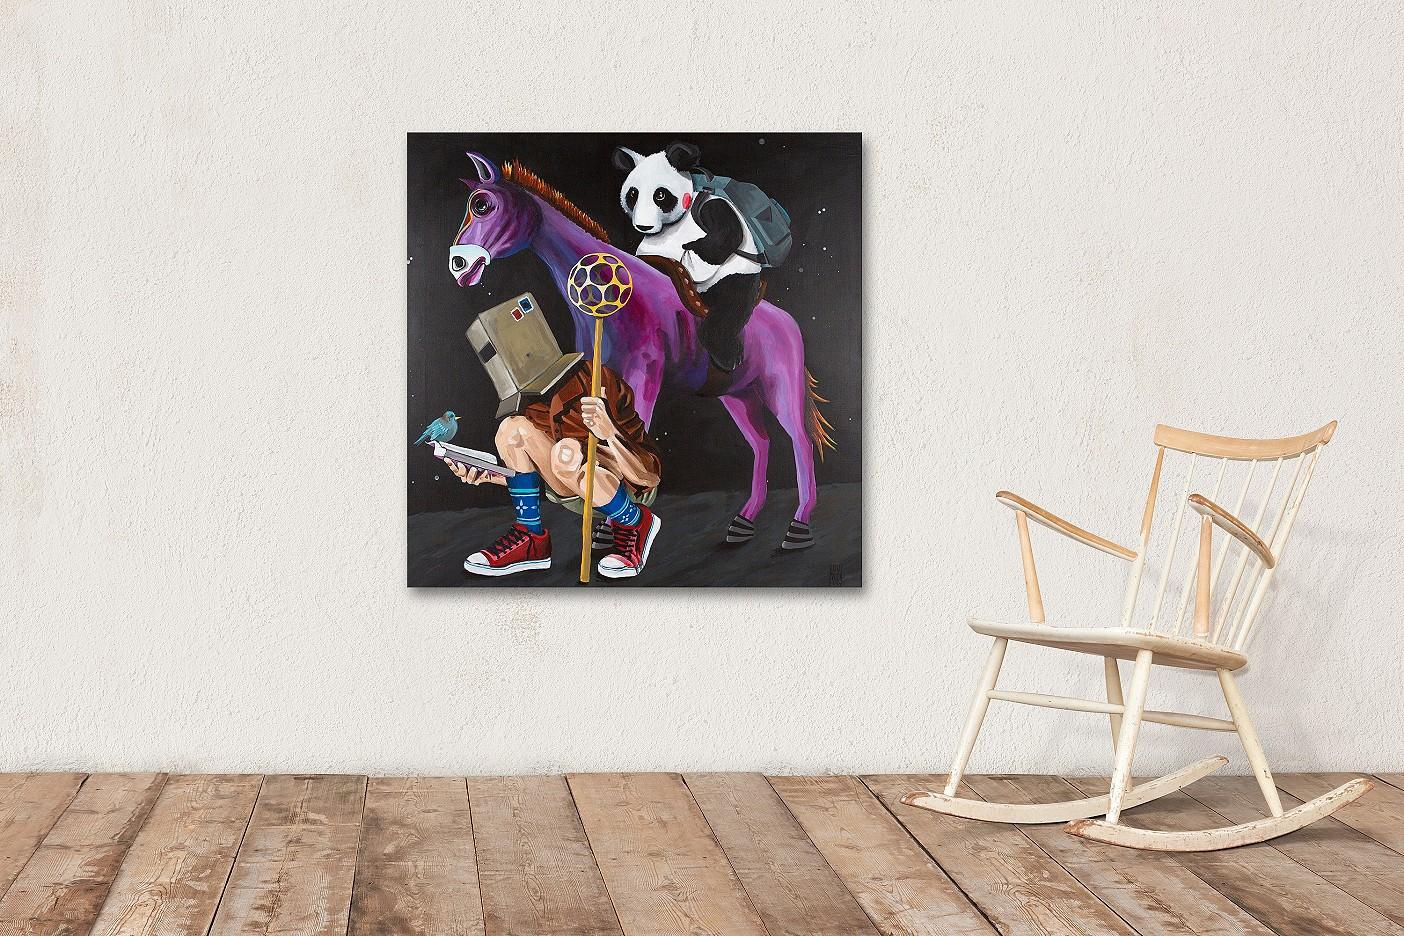 Don Quijote und Sancho Panda